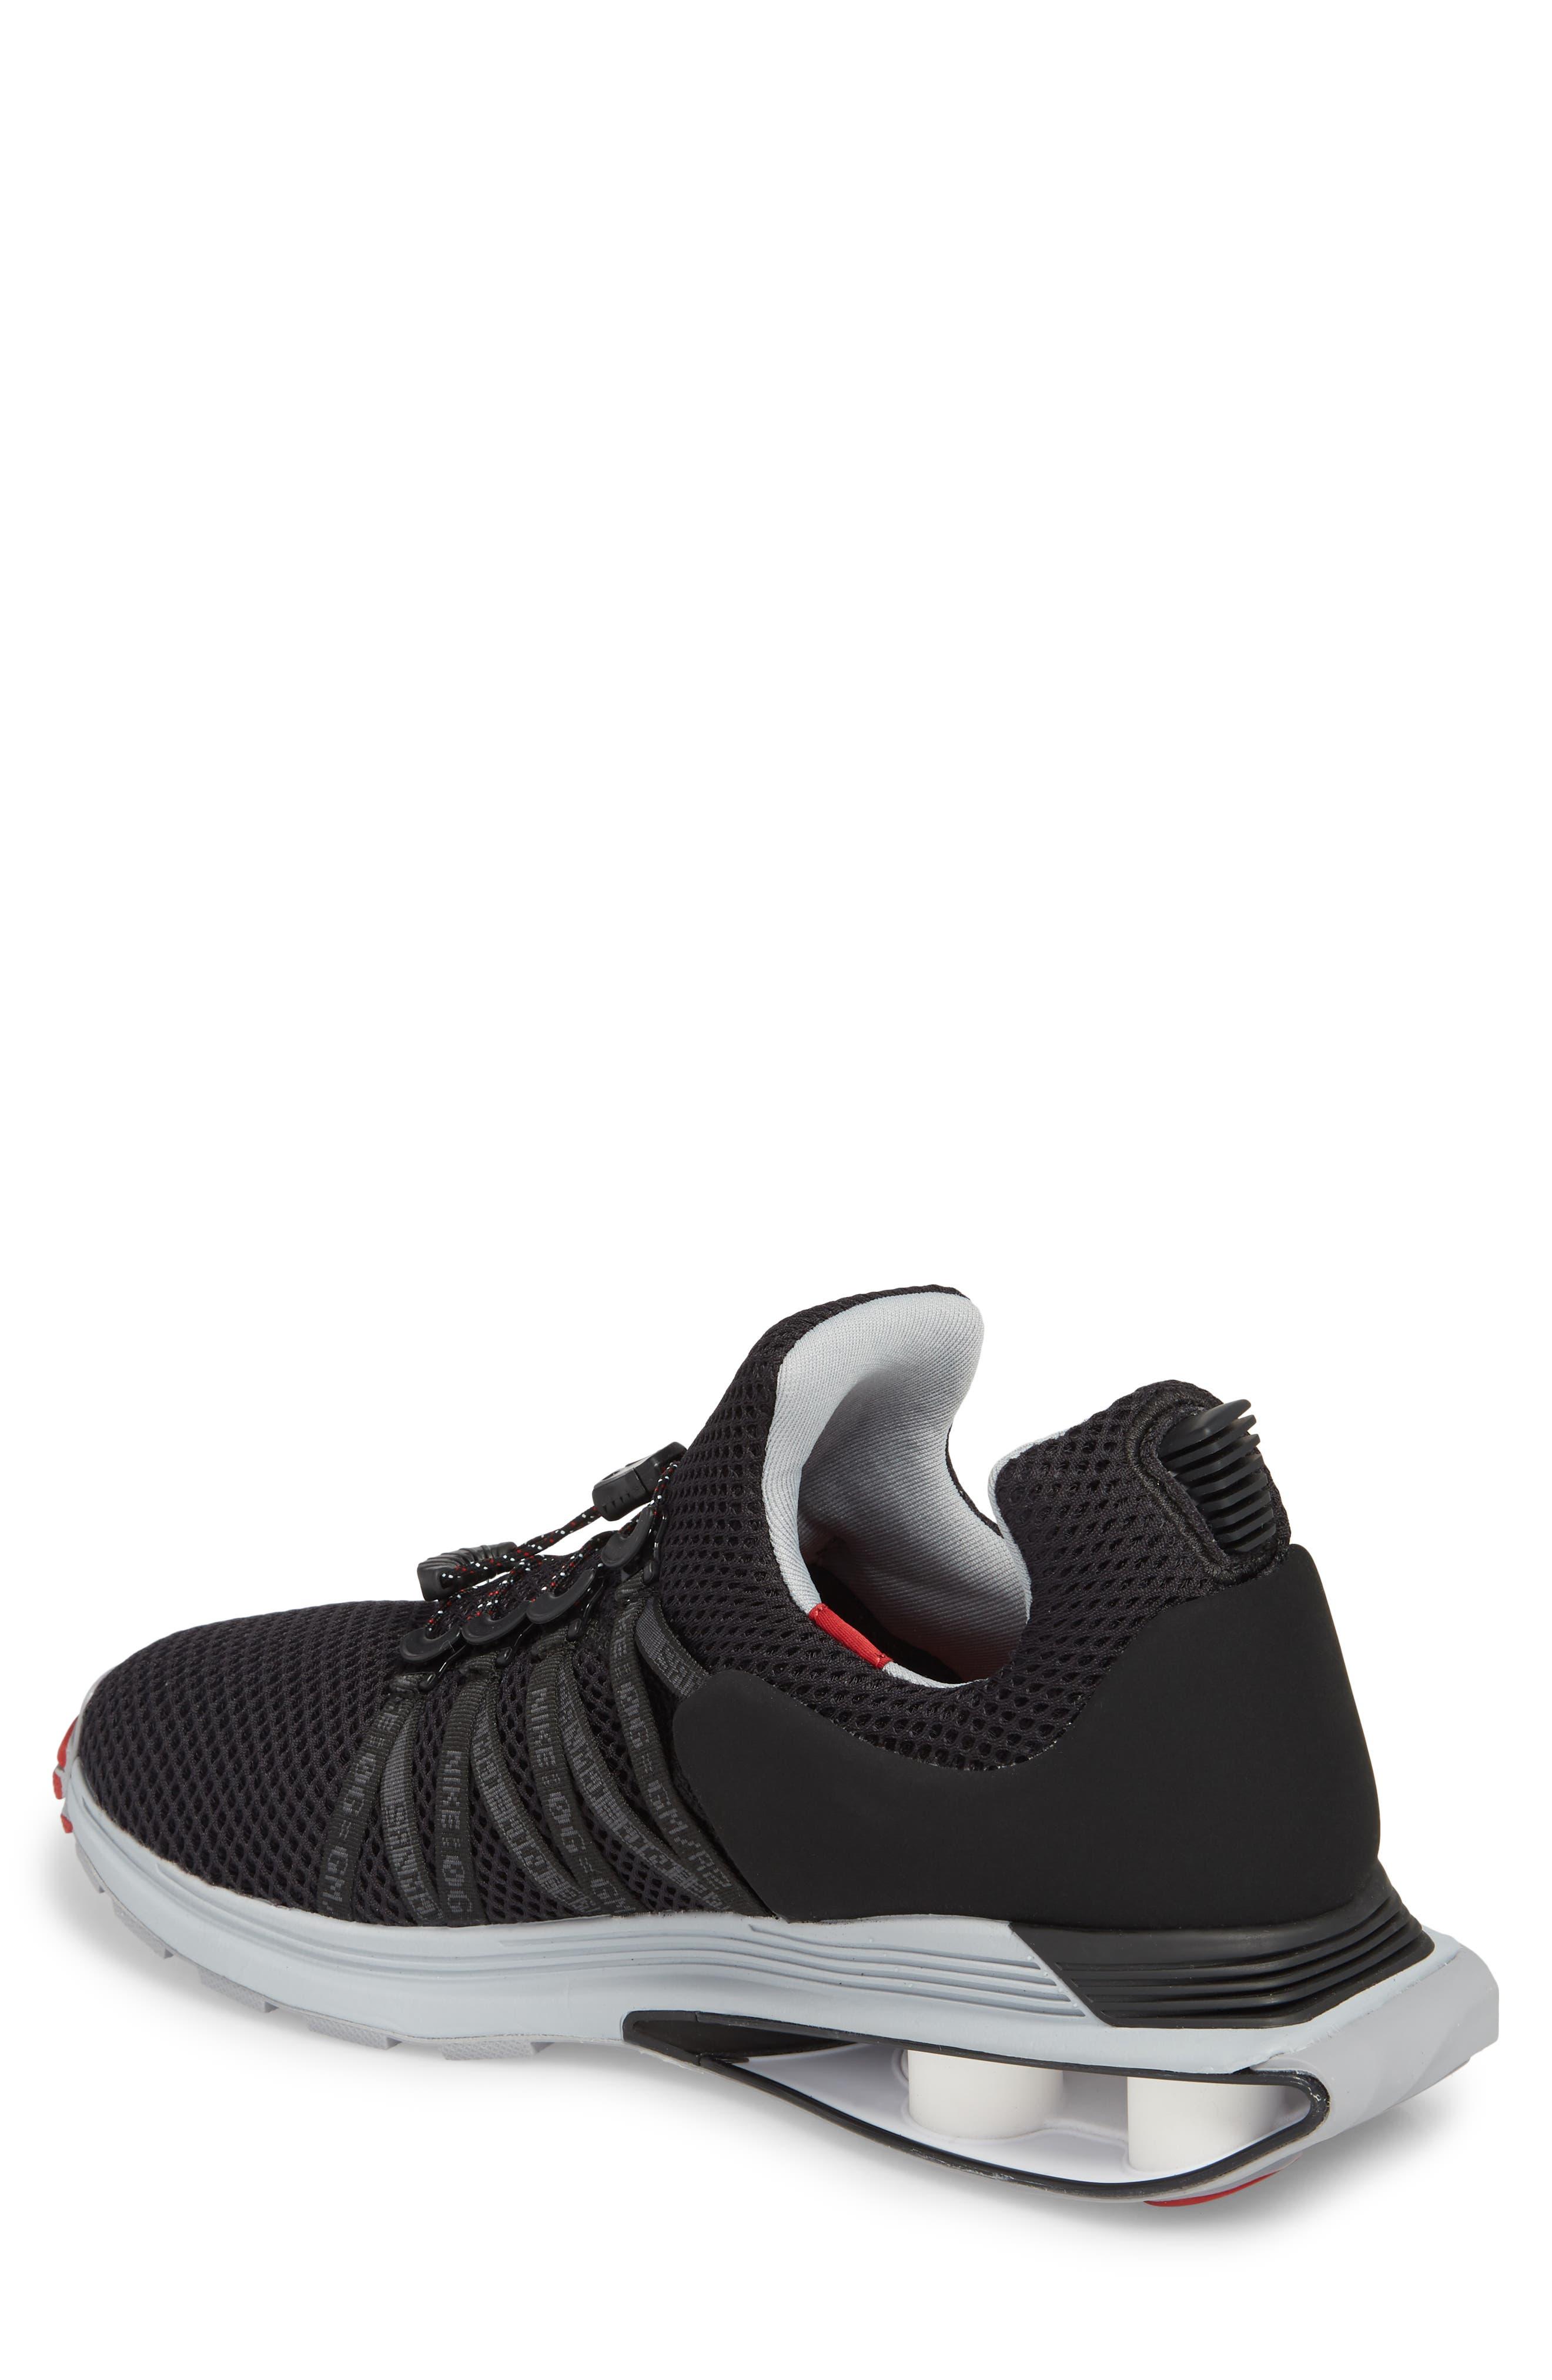 Shox Gravity Sneaker,                             Alternate thumbnail 2, color,                             016